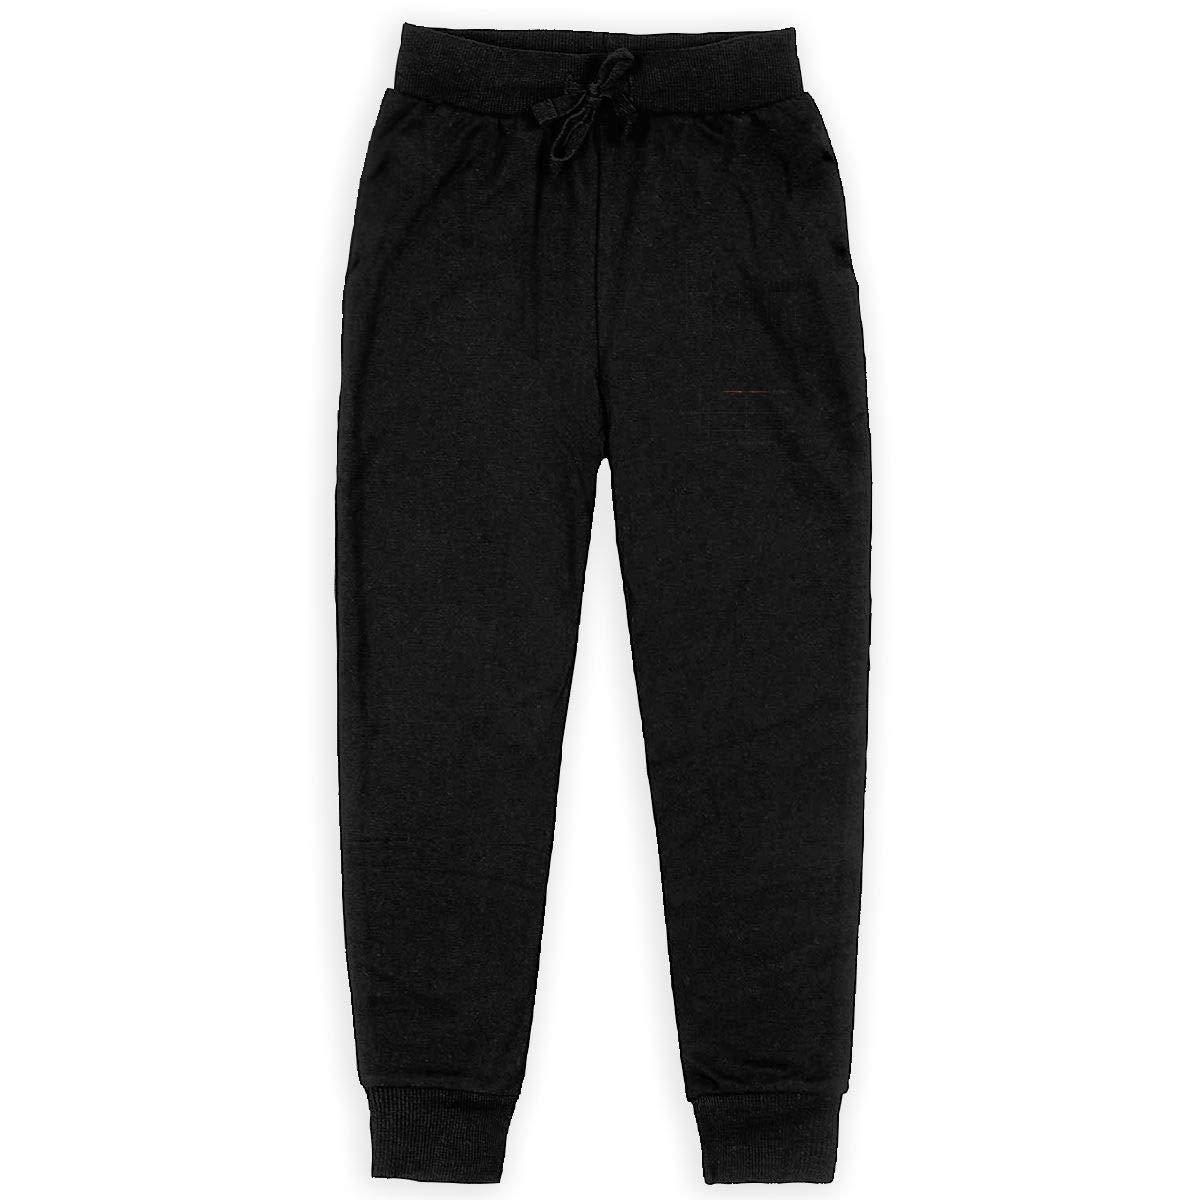 Kim Mittelstaedt Rock /& Rolle Boys Big Active Basic Casual Pants Sweatpants for Boys Black